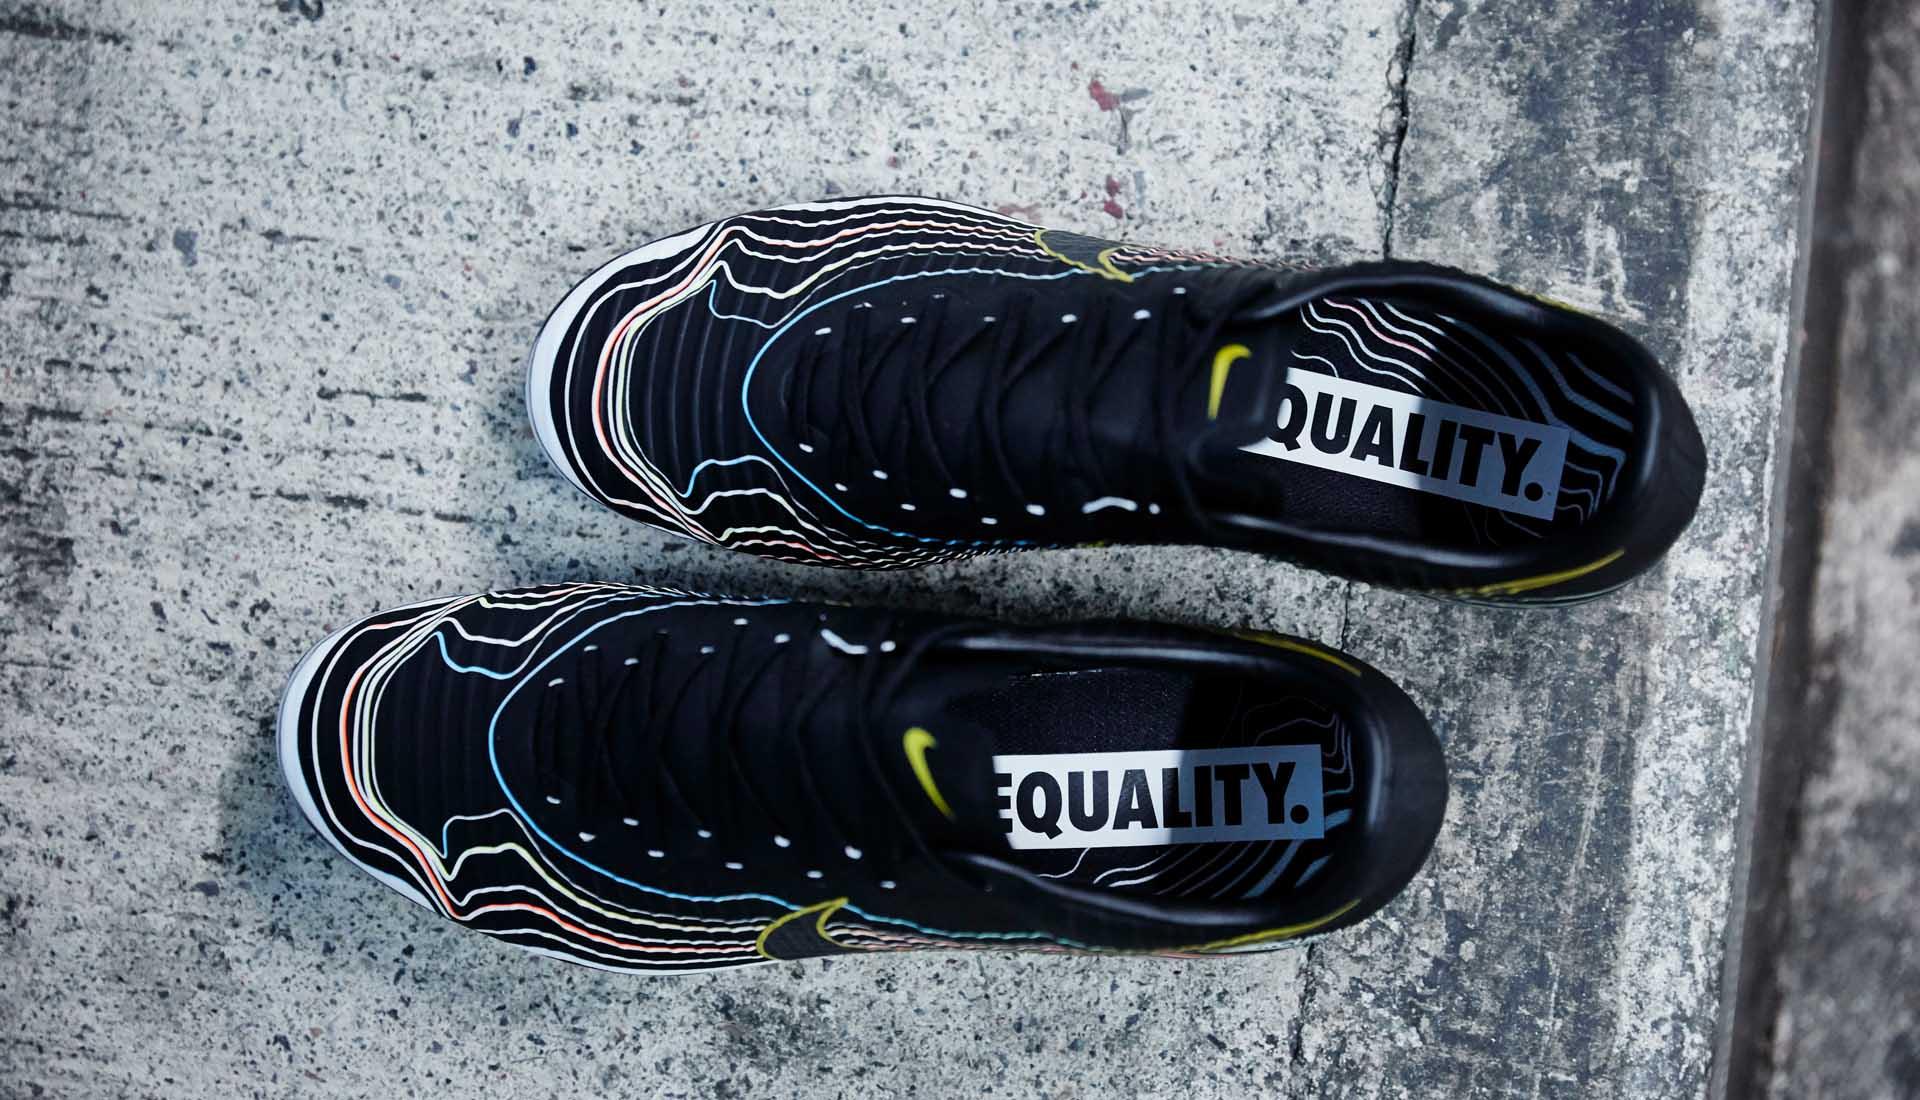 5e9fbdf0a882 Nike Launch The BHM Mercurial Vapor XI - SoccerBible